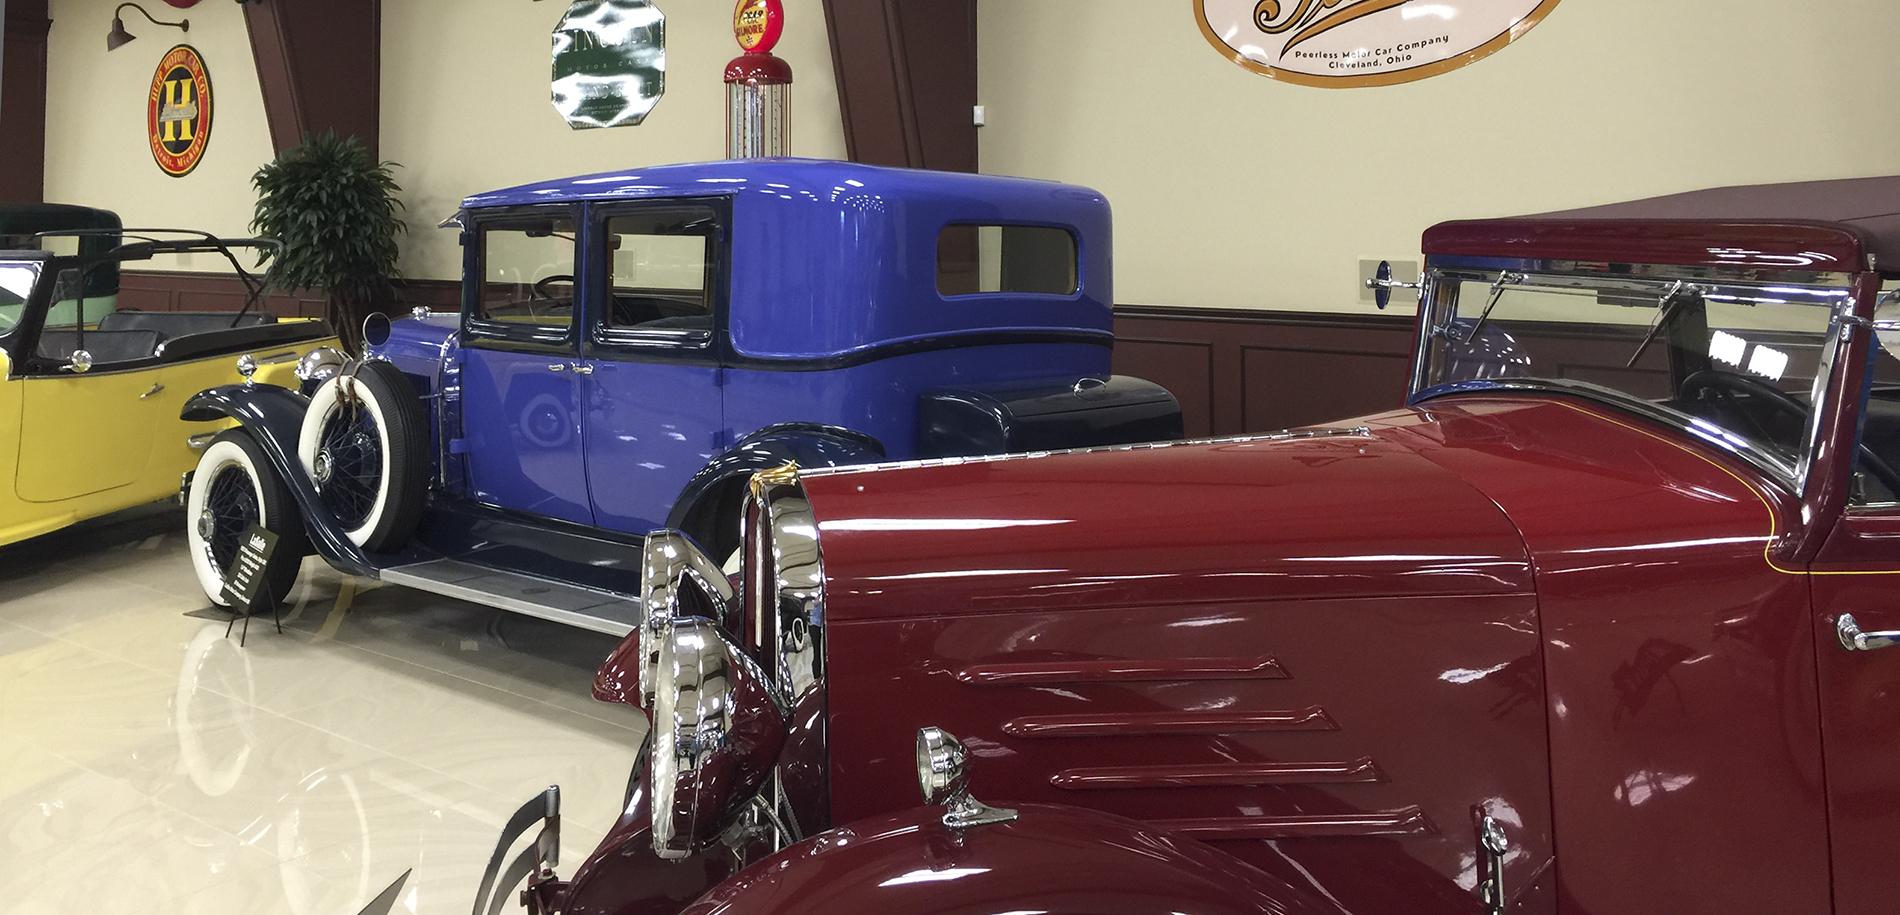 Automotive-Museum.jpg